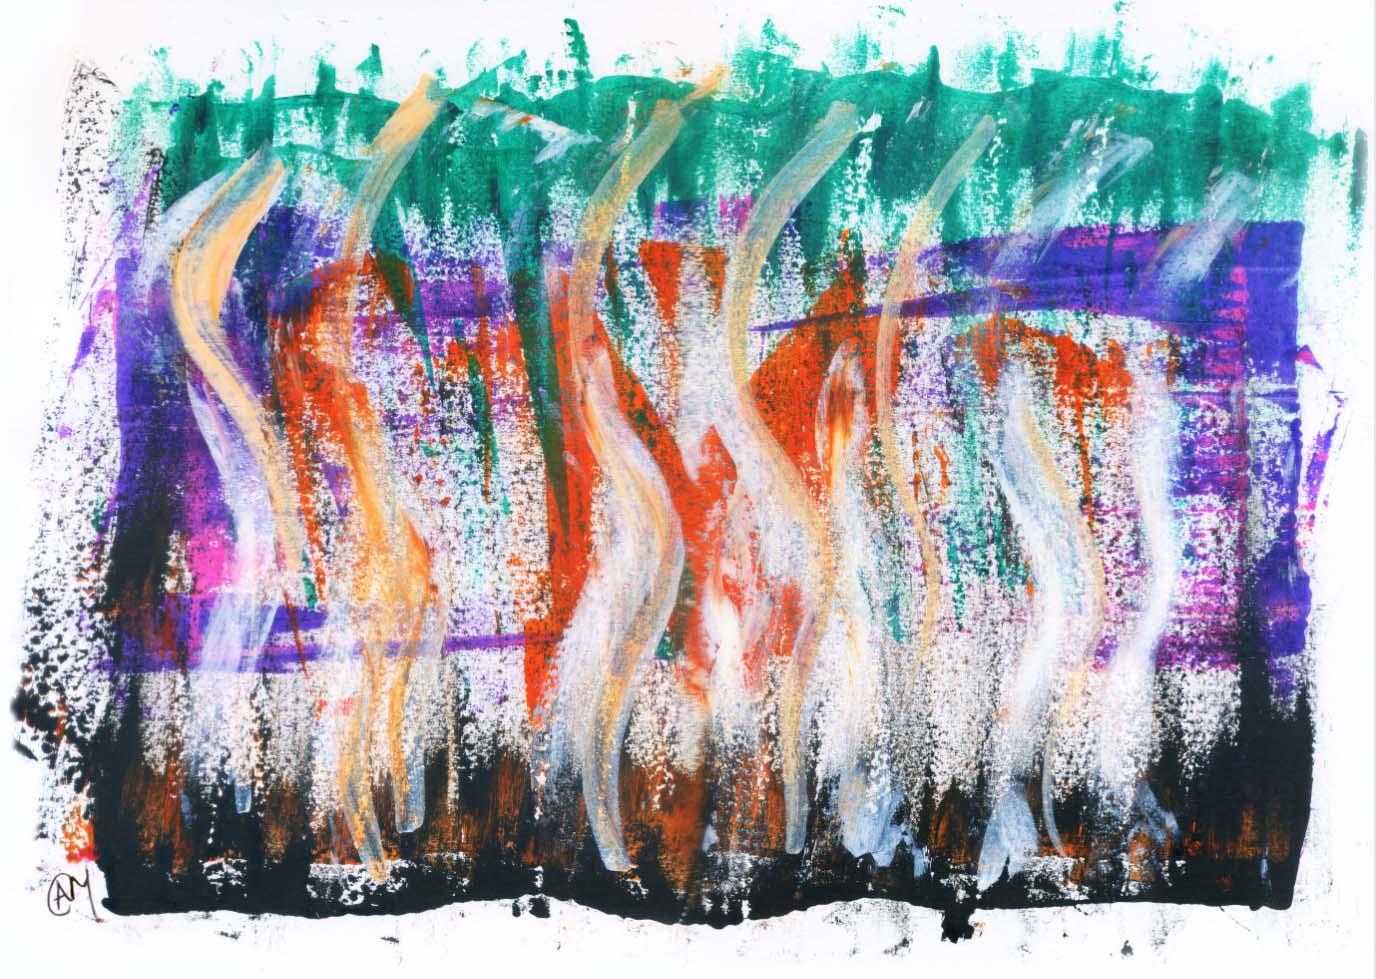 Flames of Passion - Nancy Badran